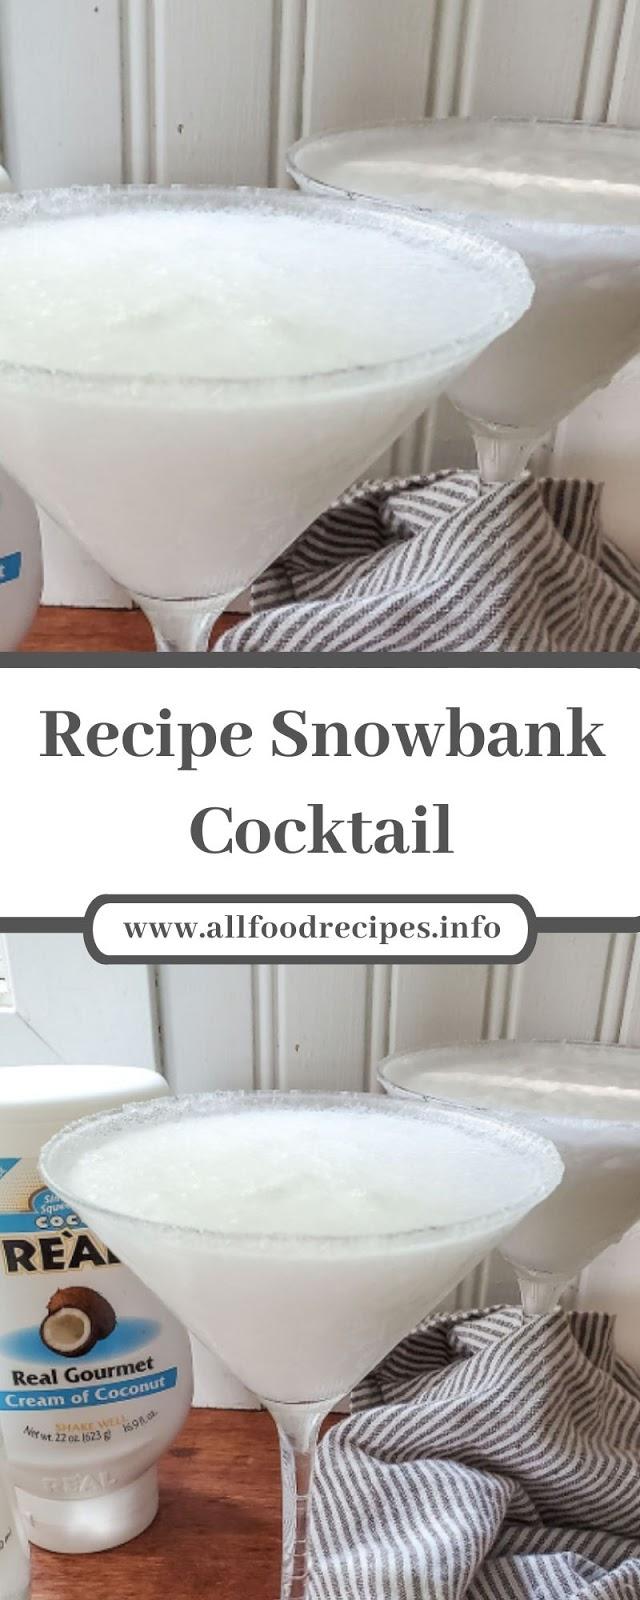 Recipe Snowbank Cocktail